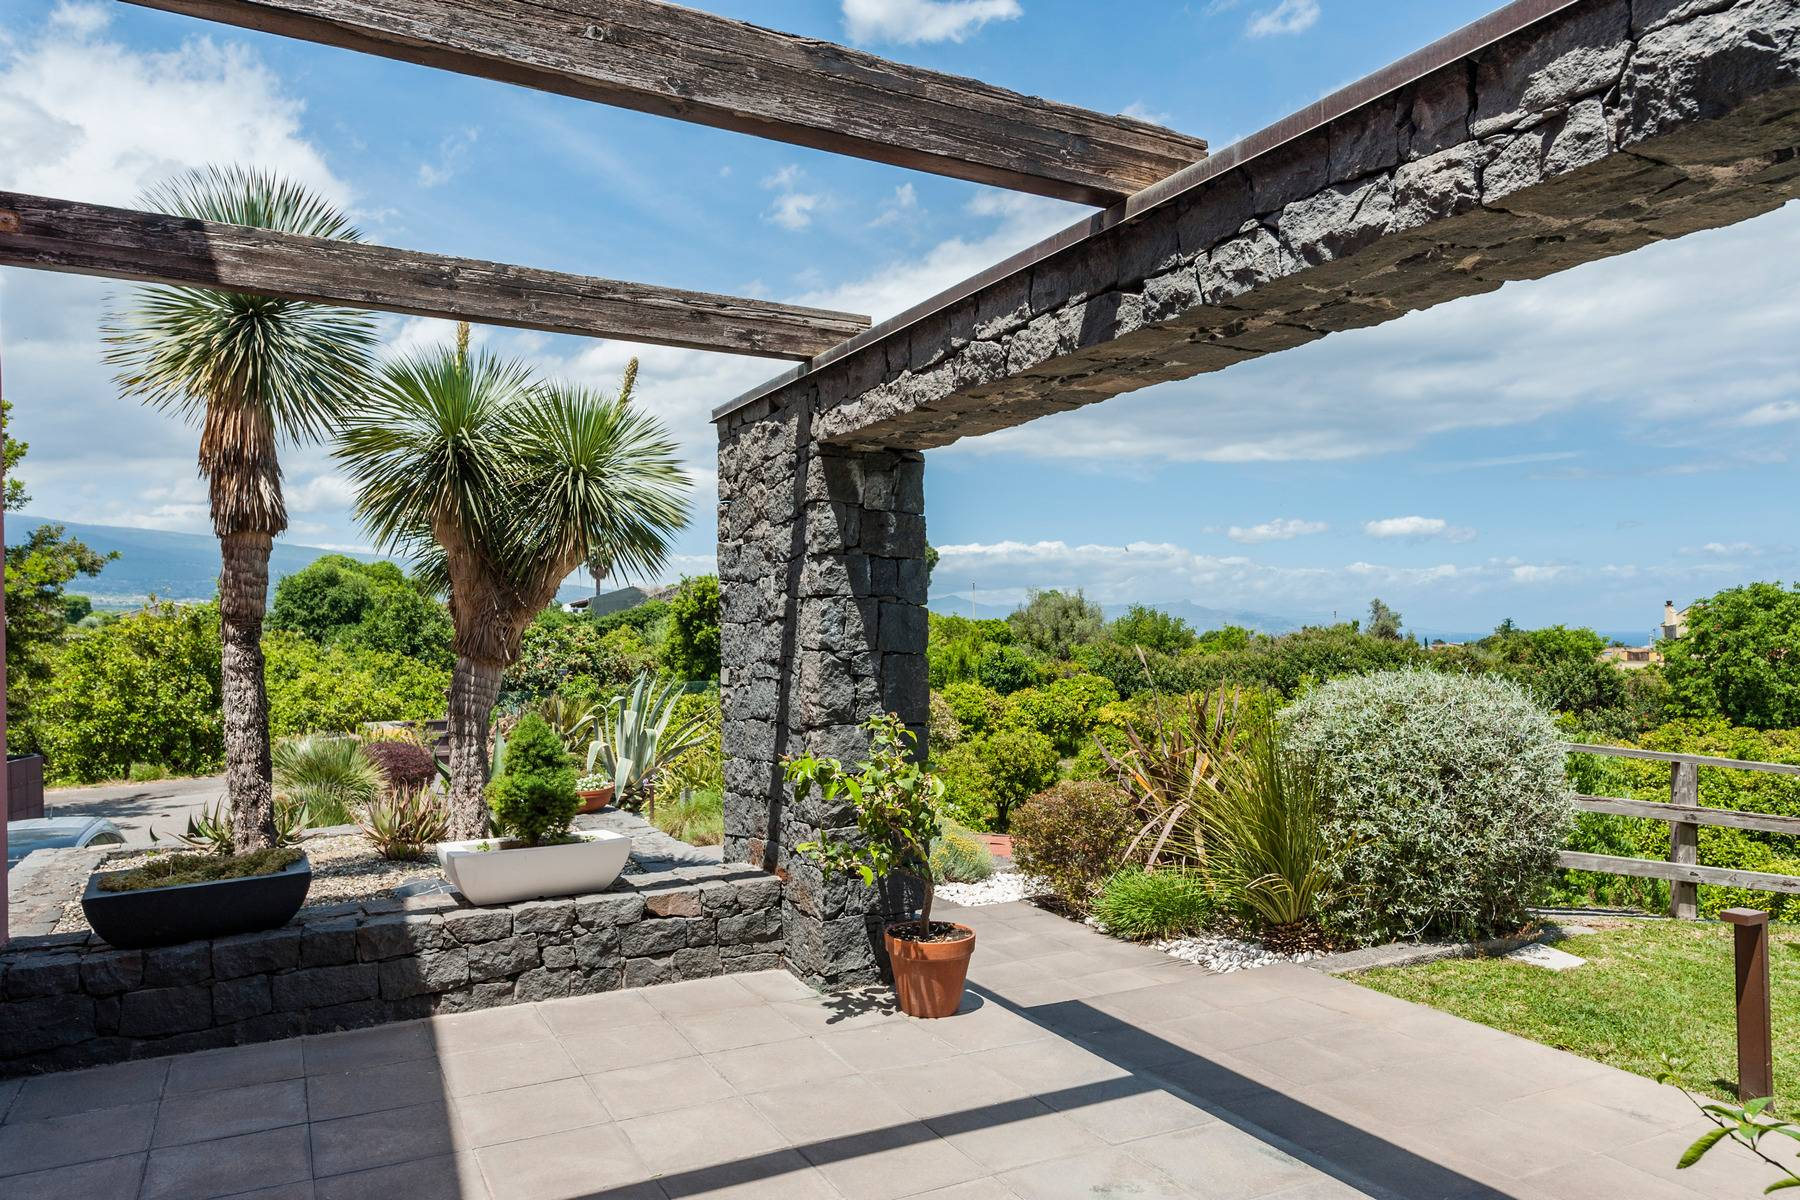 Villa esclusiva con piscina con vista ad Acireale - 25